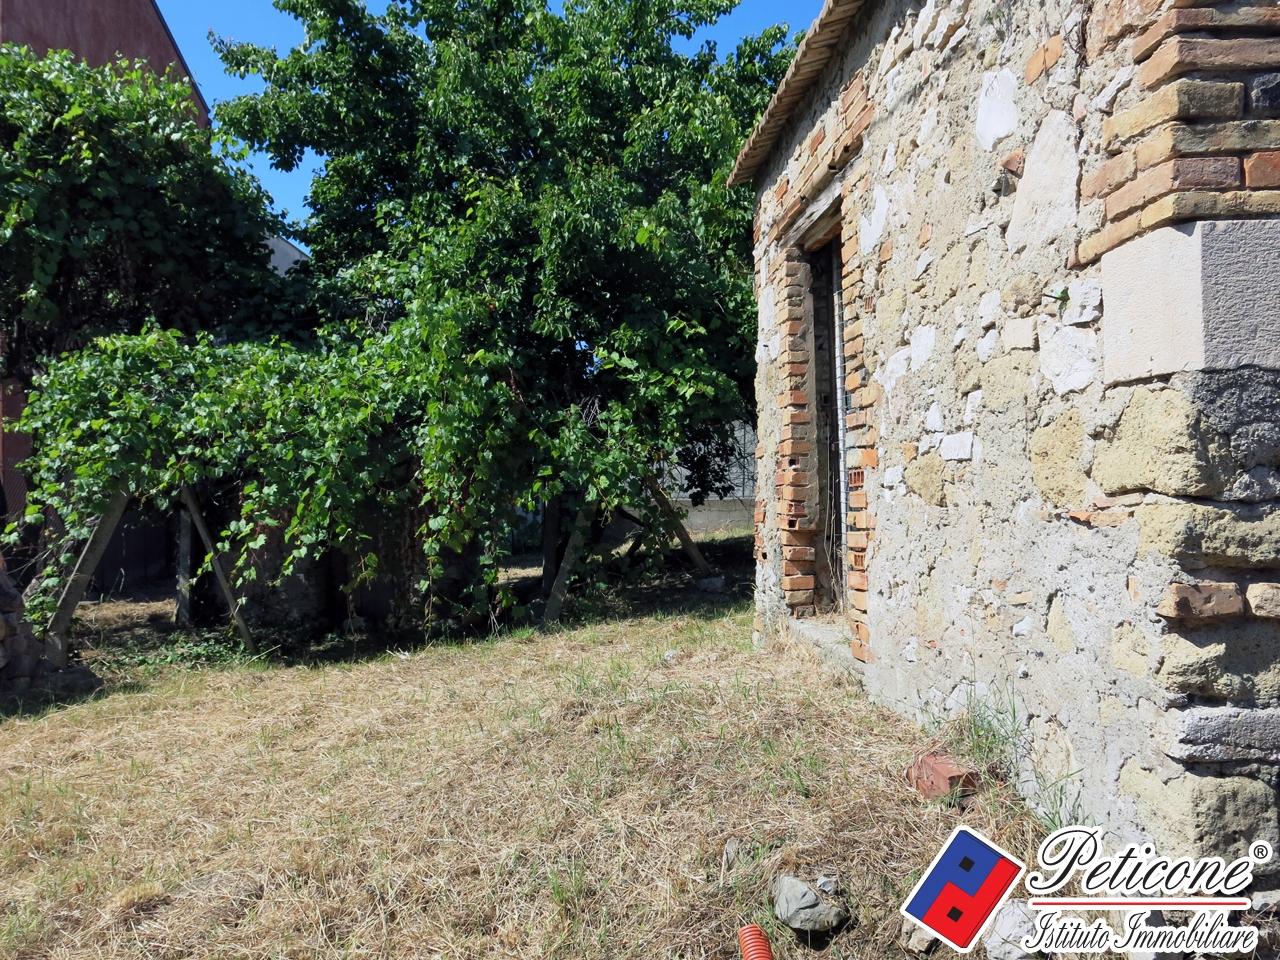 Villa in Vendita a Gaeta: 5 locali, 250 mq - Foto 27